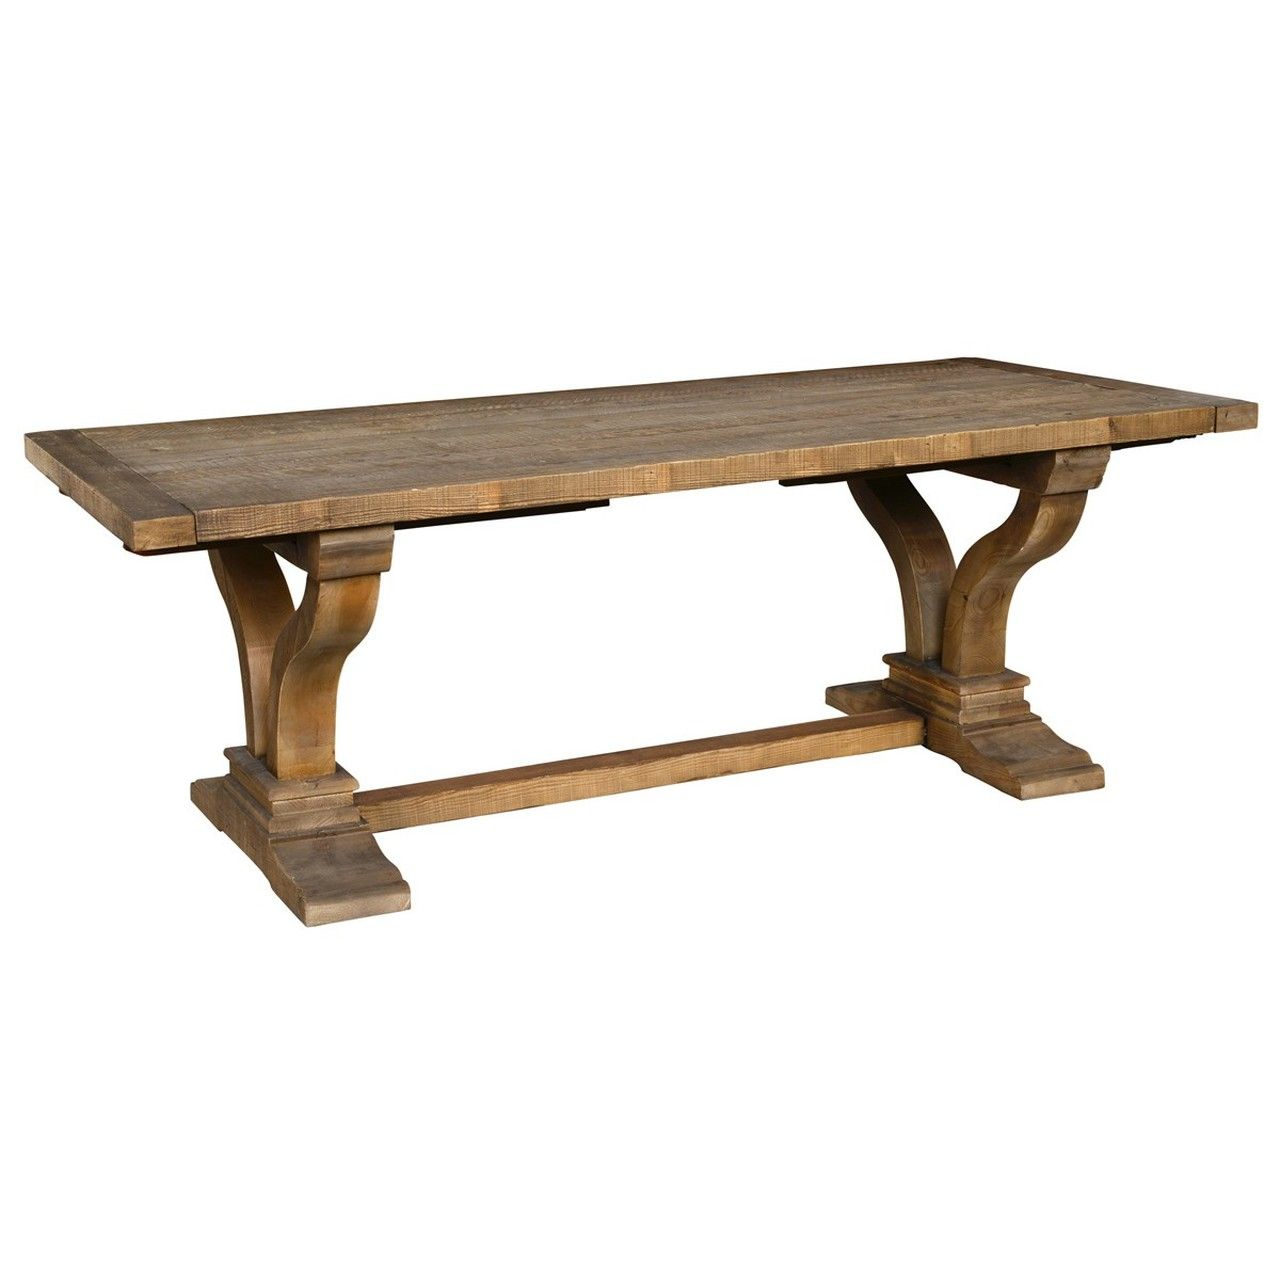 Spanish Farmhouse Reclaimed Wood Trestle Extension Table